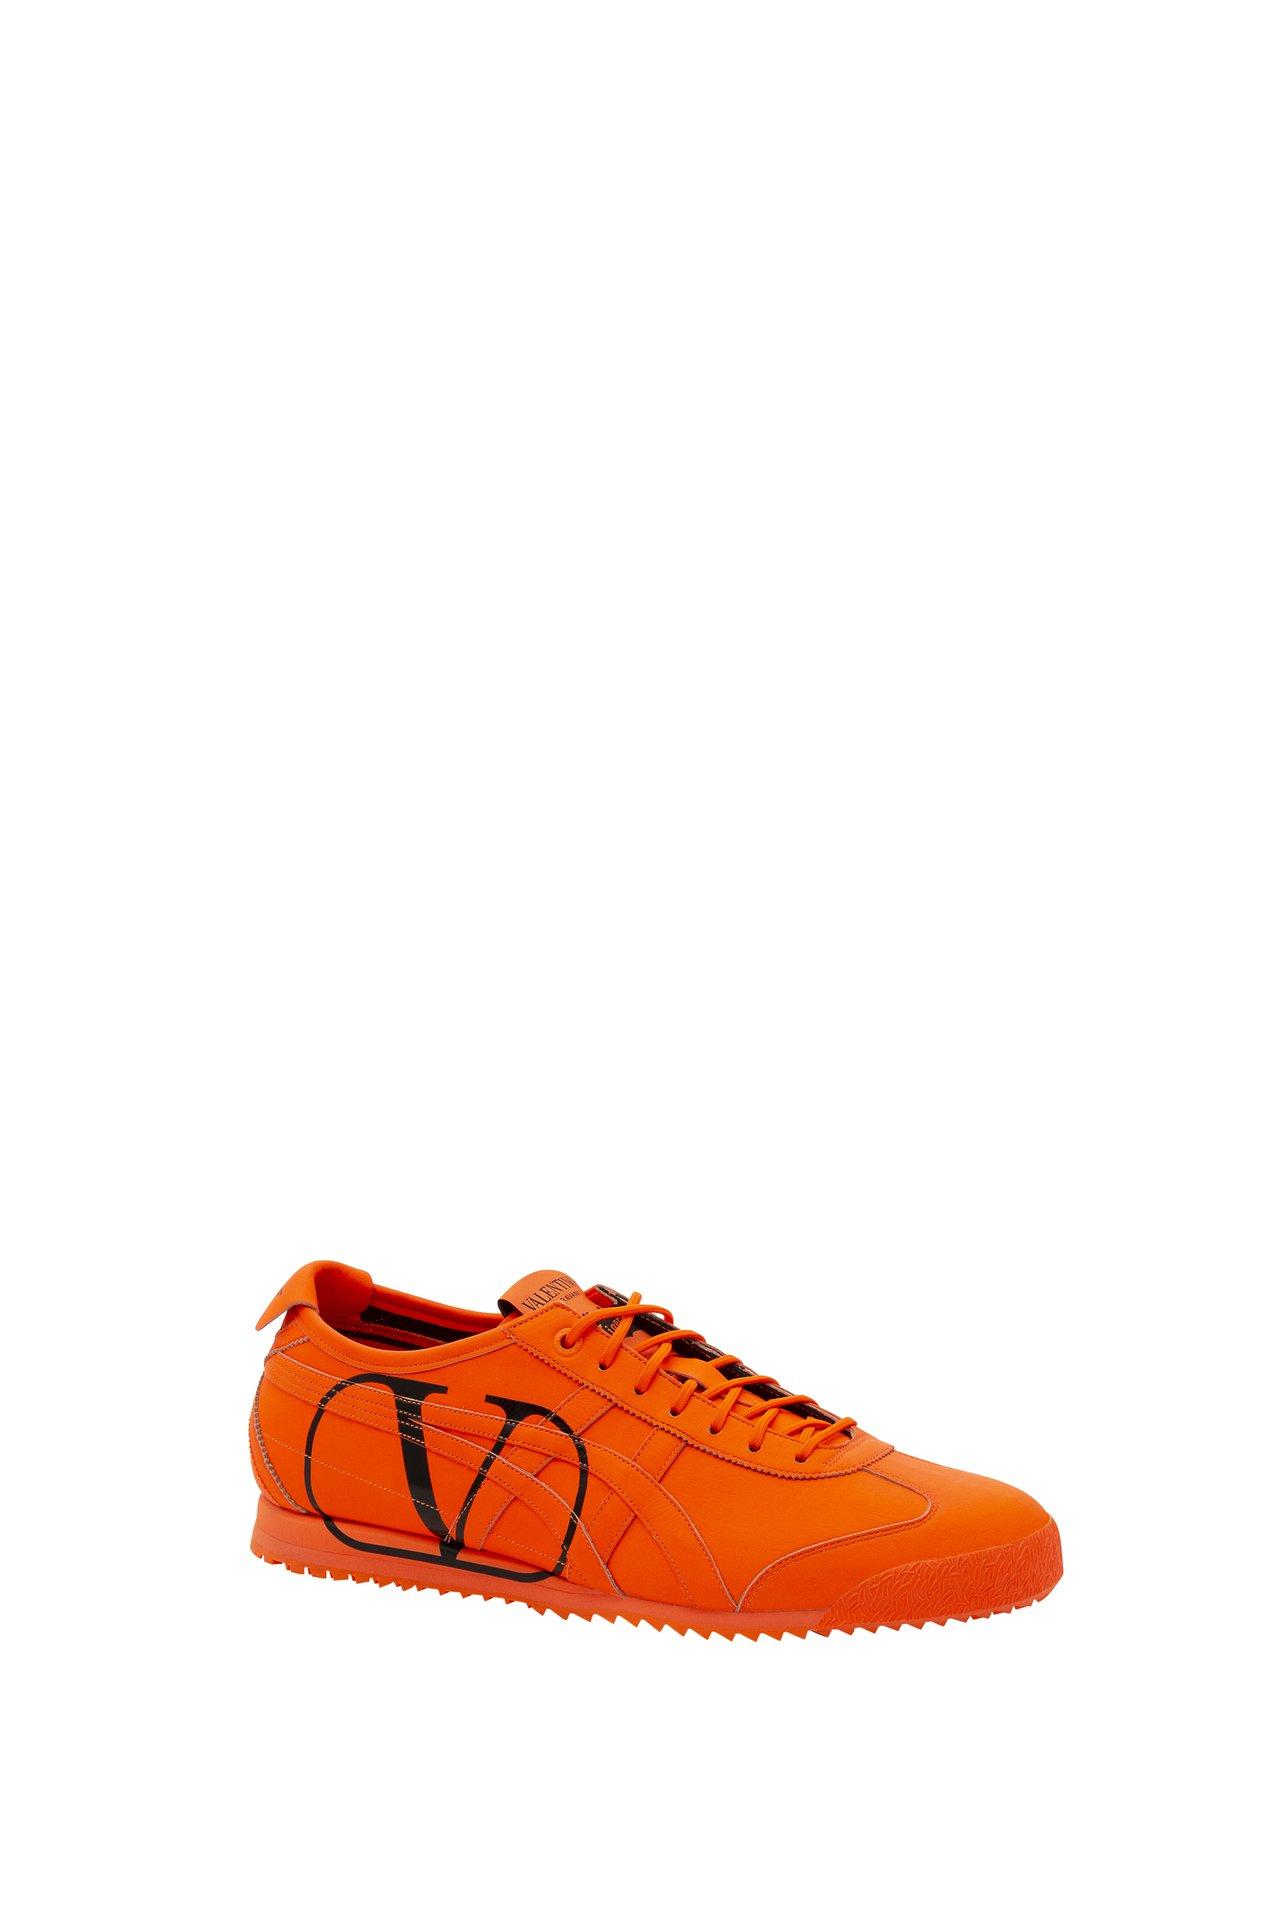 Valentino攜手日本時尚運動品牌Onitsuka Tiger合作,以著名的...